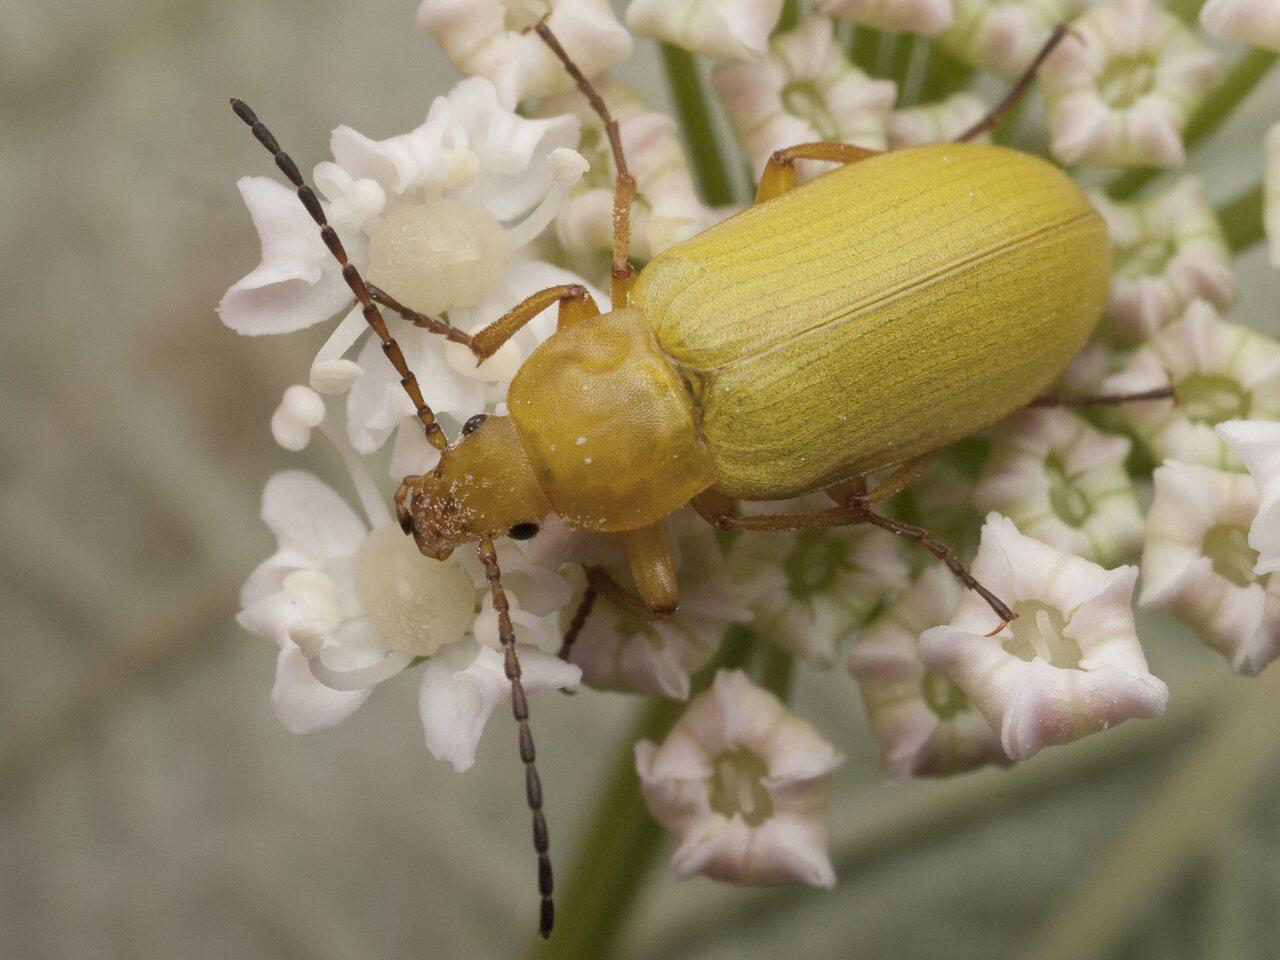 Cteniopus-flavus-1254.jpg